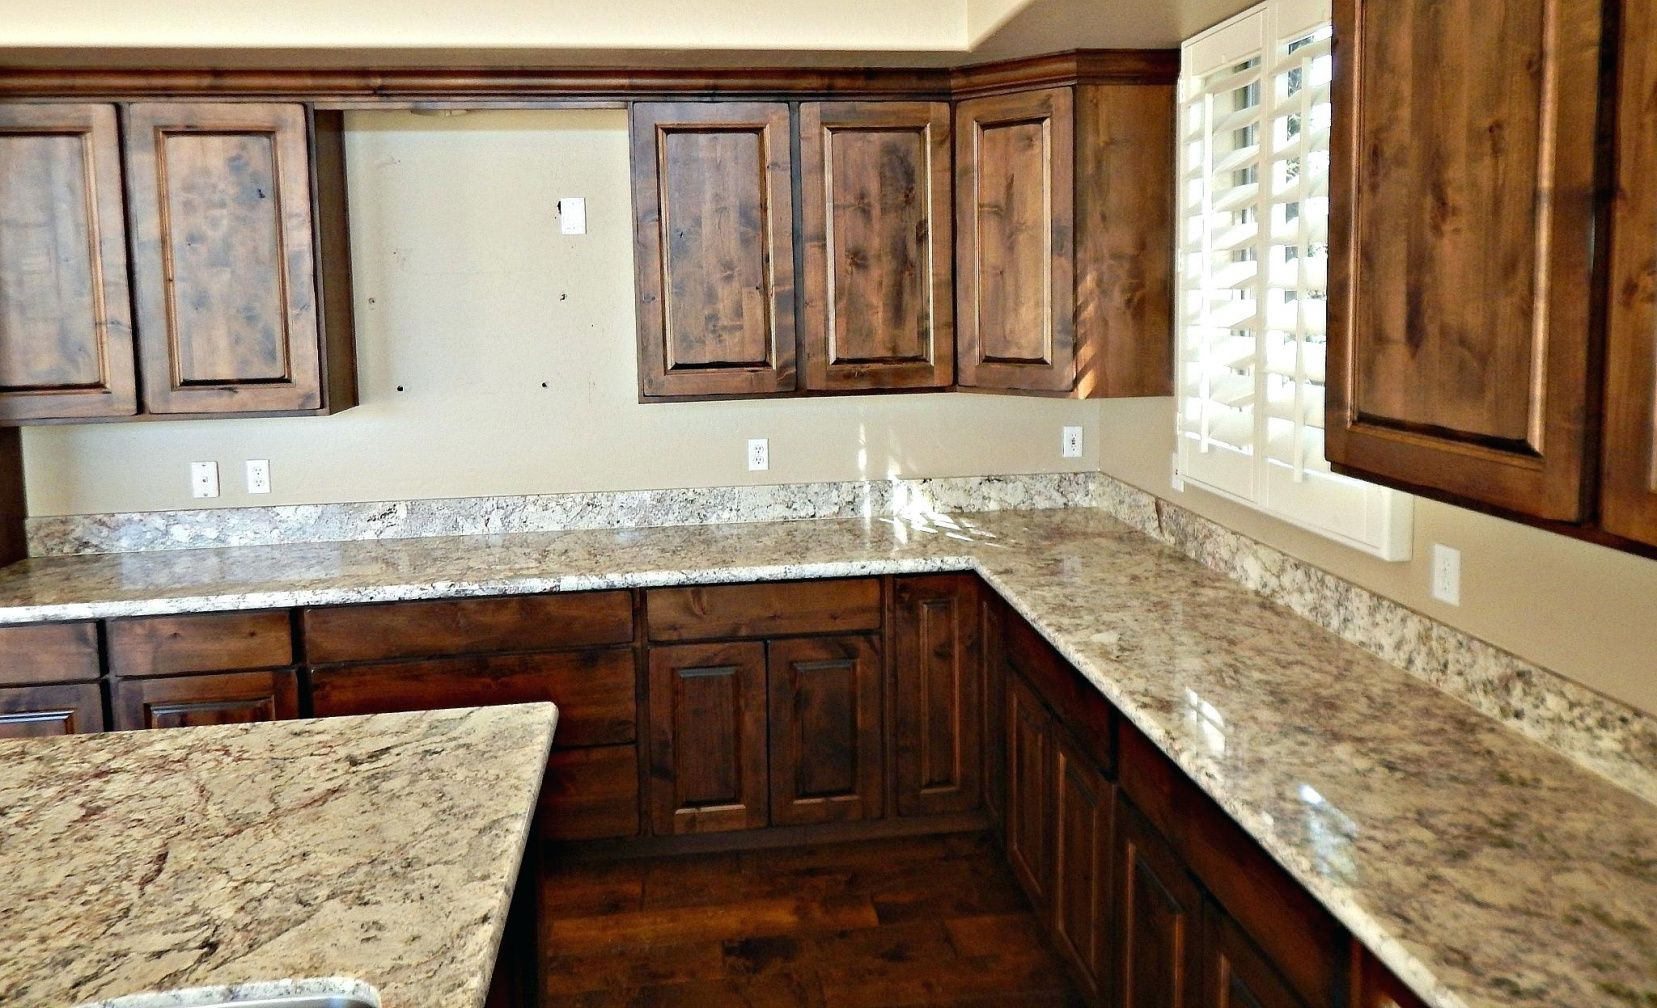 99 Granite Countertops Wholesale Near Me Kitchen Floor Vinyl Ideas Check Granite Countertops Kitchen White